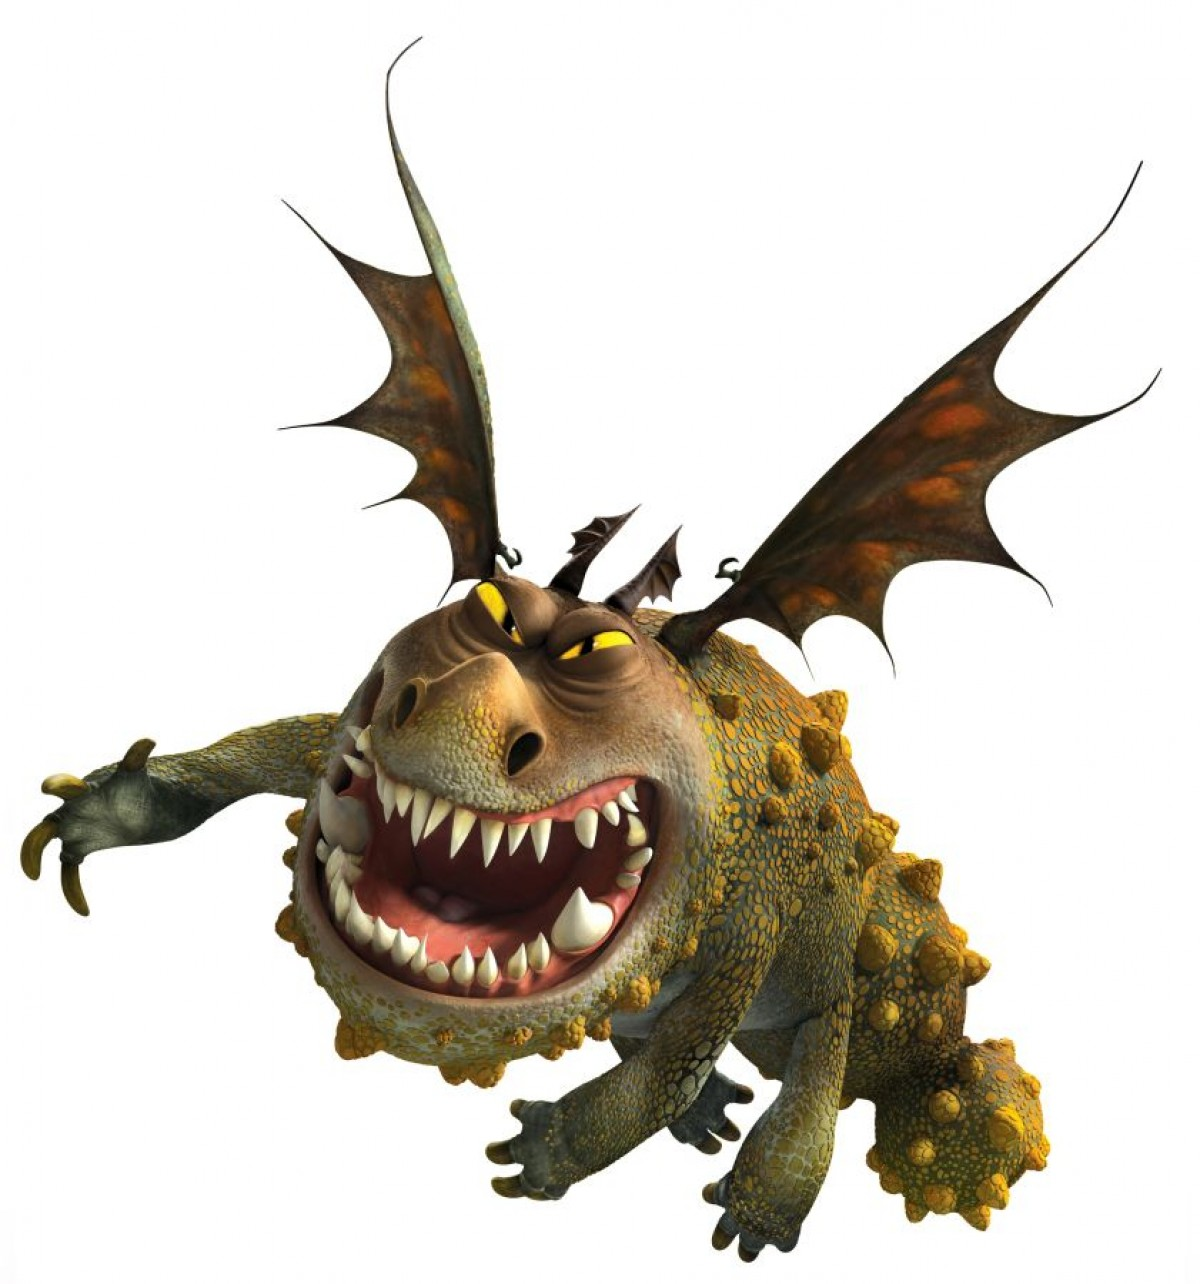 Meatlug Dragonpedia How To Train Your Dragon